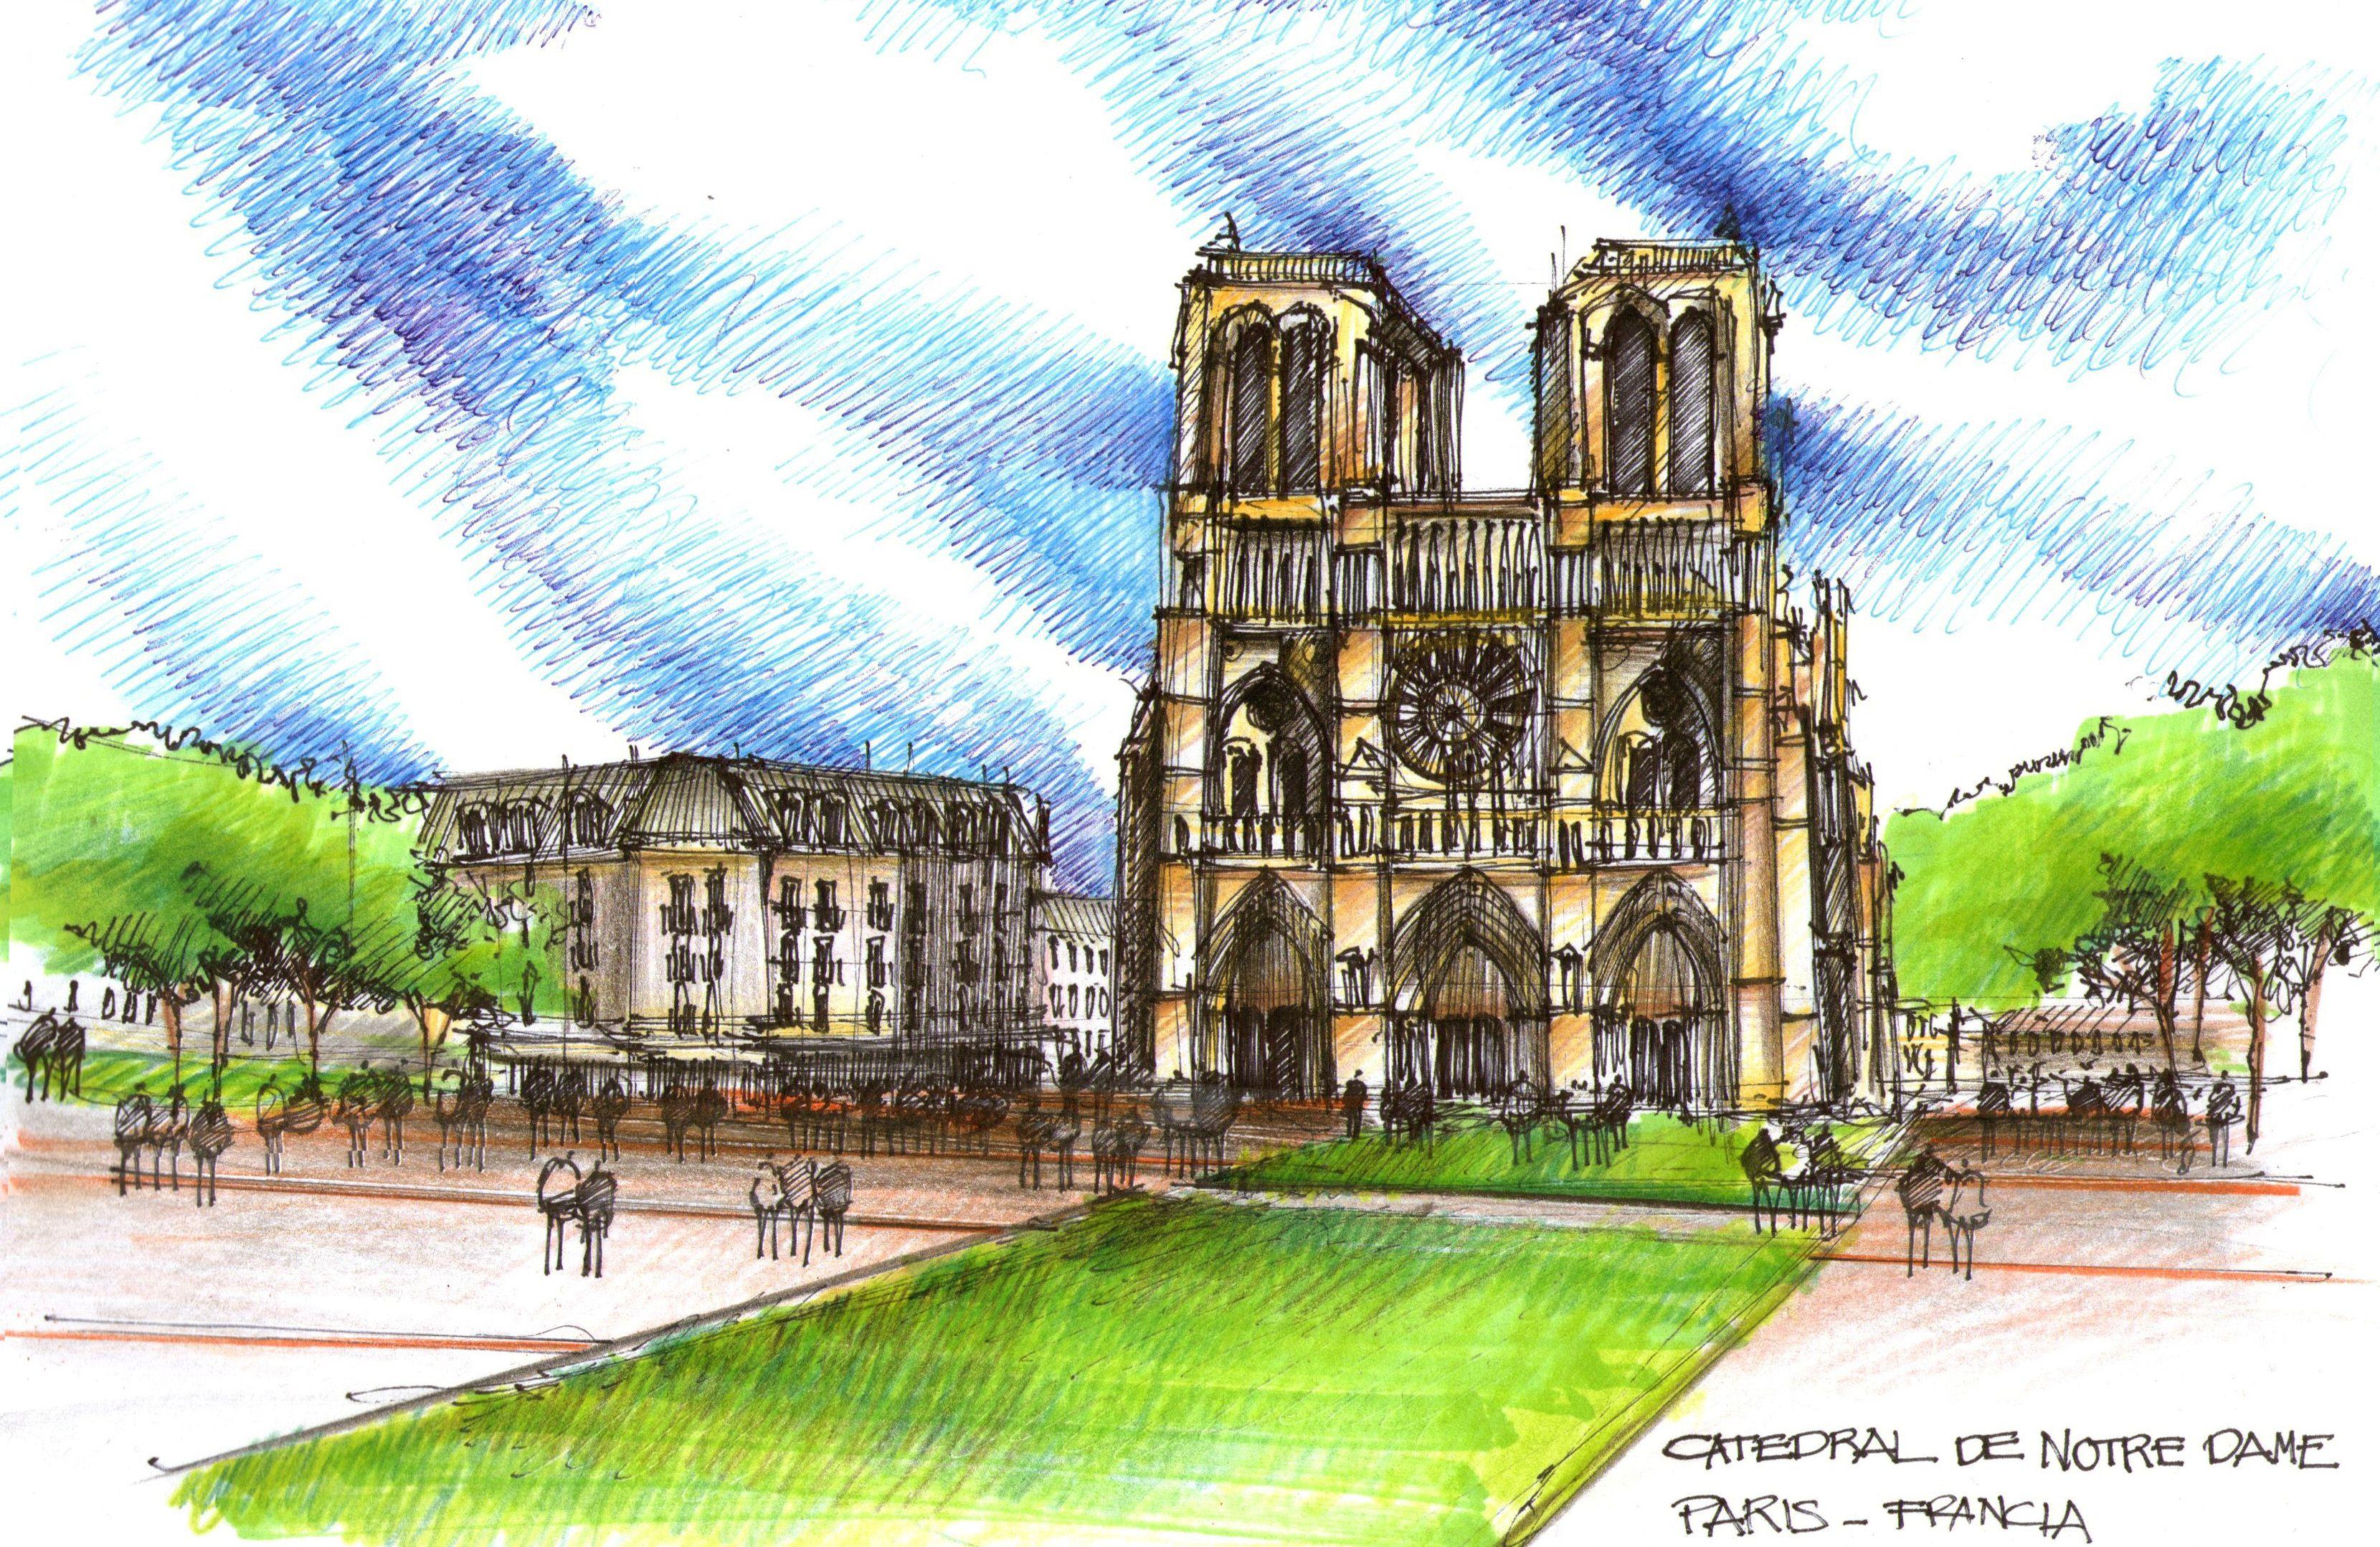 Catedral De Notre Dame Paris Dibujo A Mano Alzada Pinterest  # Muebles Sion Bogota